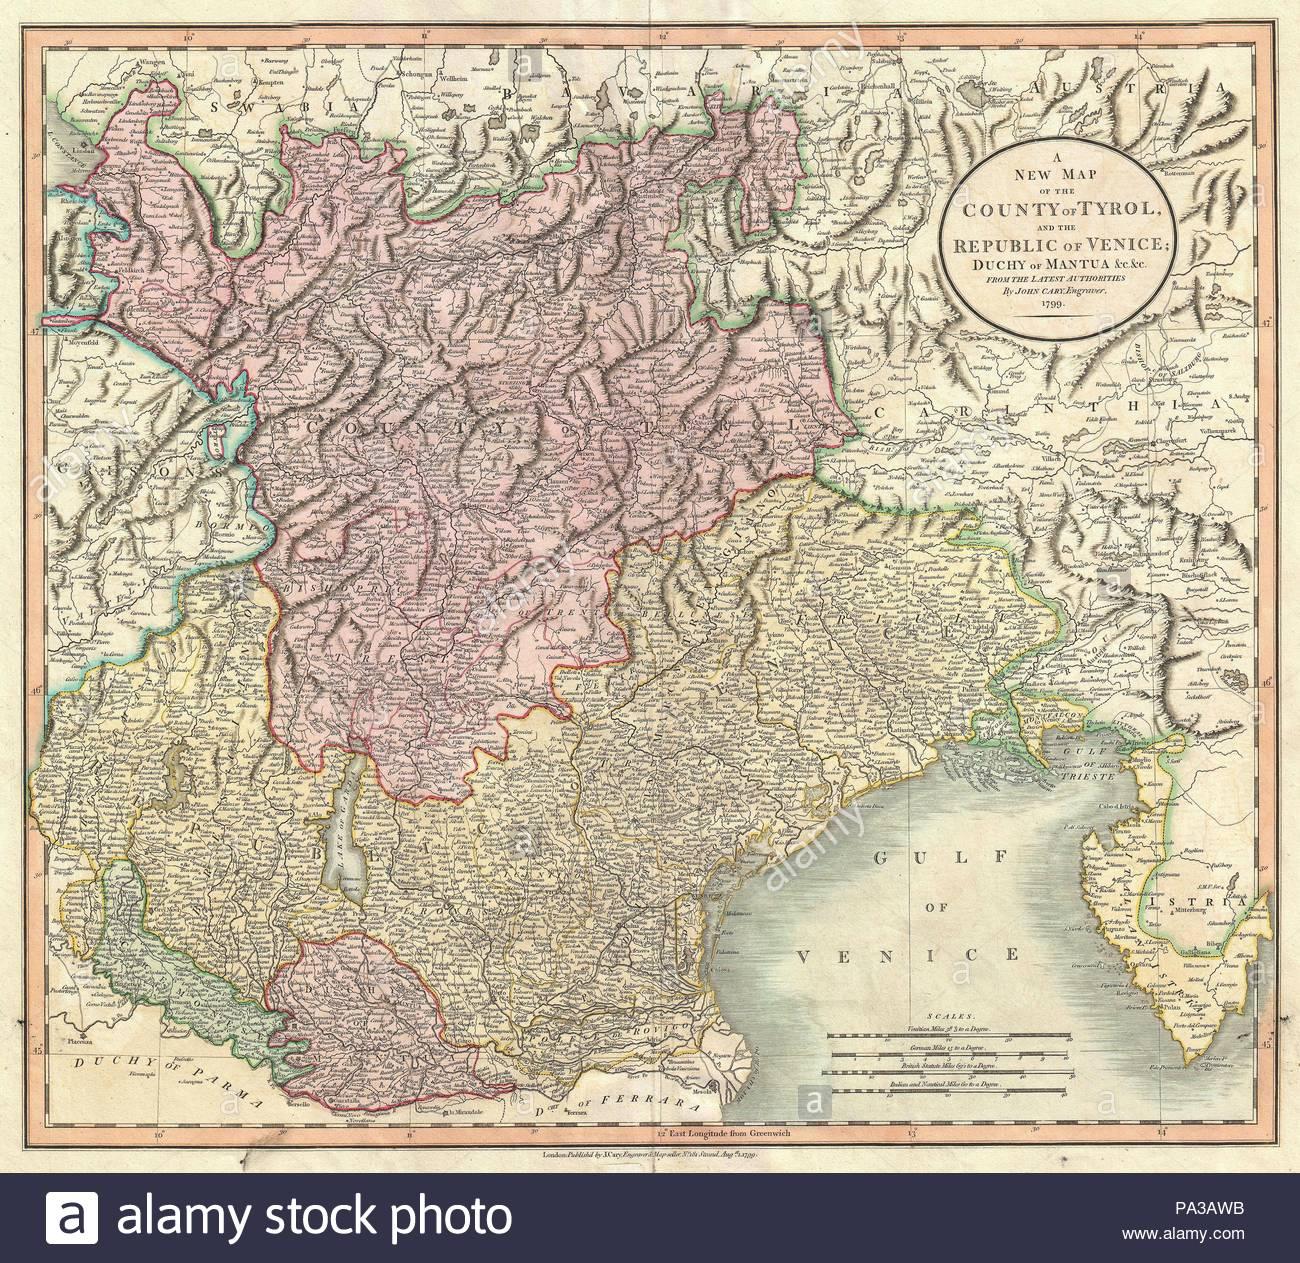 1799, Cary Map of Mantua, Venice and Tyrol, Italy, John Cary, 1754 – 1835,  was an English cartographer, John Cary, 1754 – 1835, English cartographer.